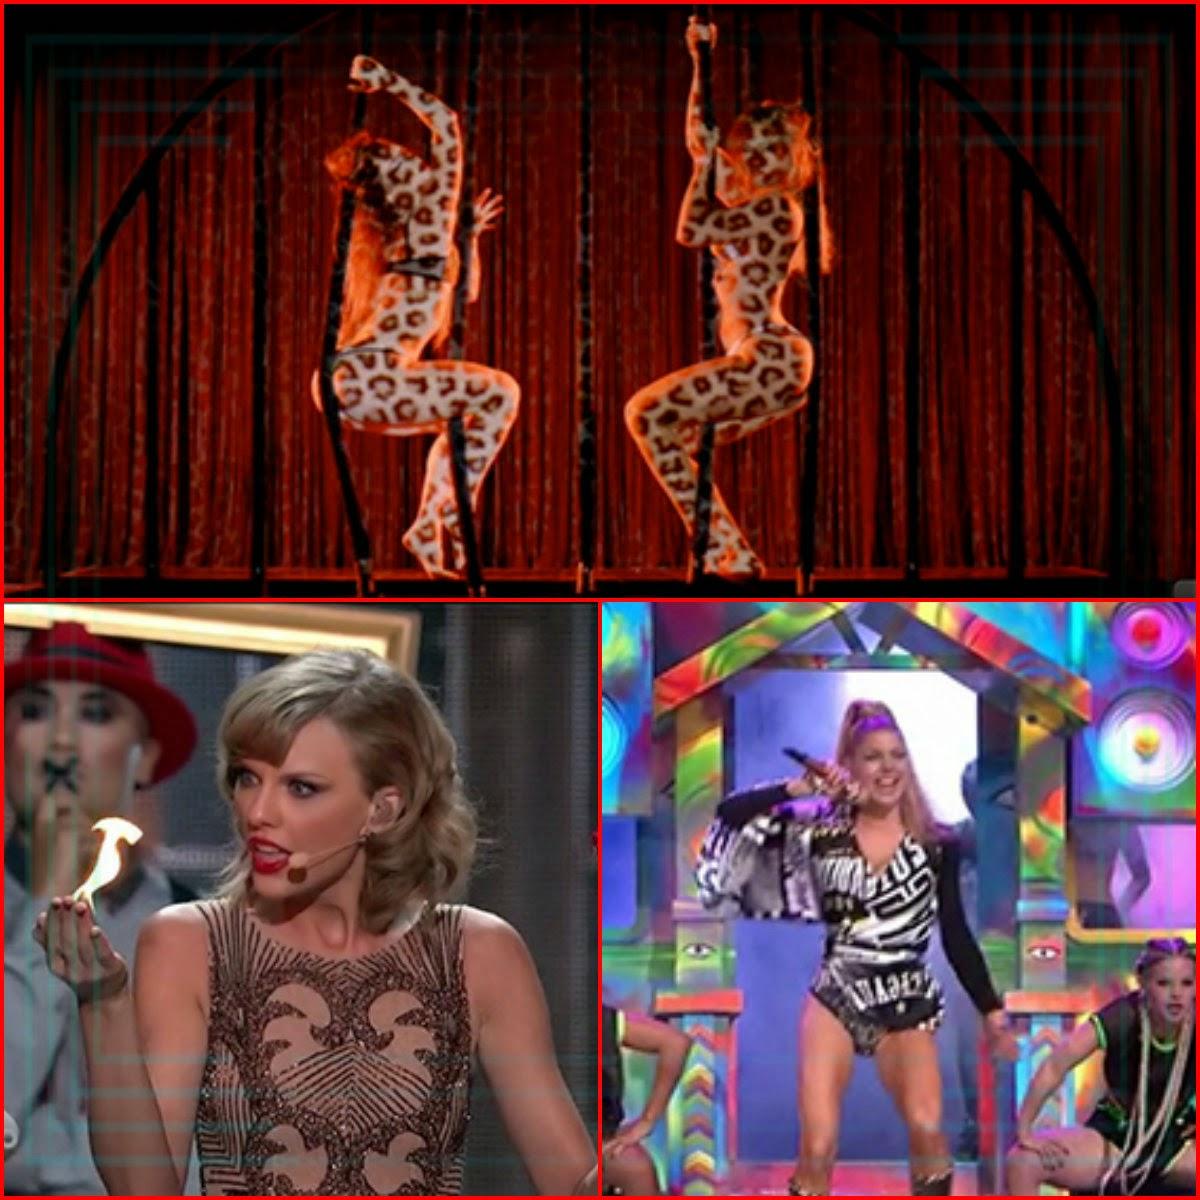 The Illuminati Symbolism Involvement On The American Music Awards 2014